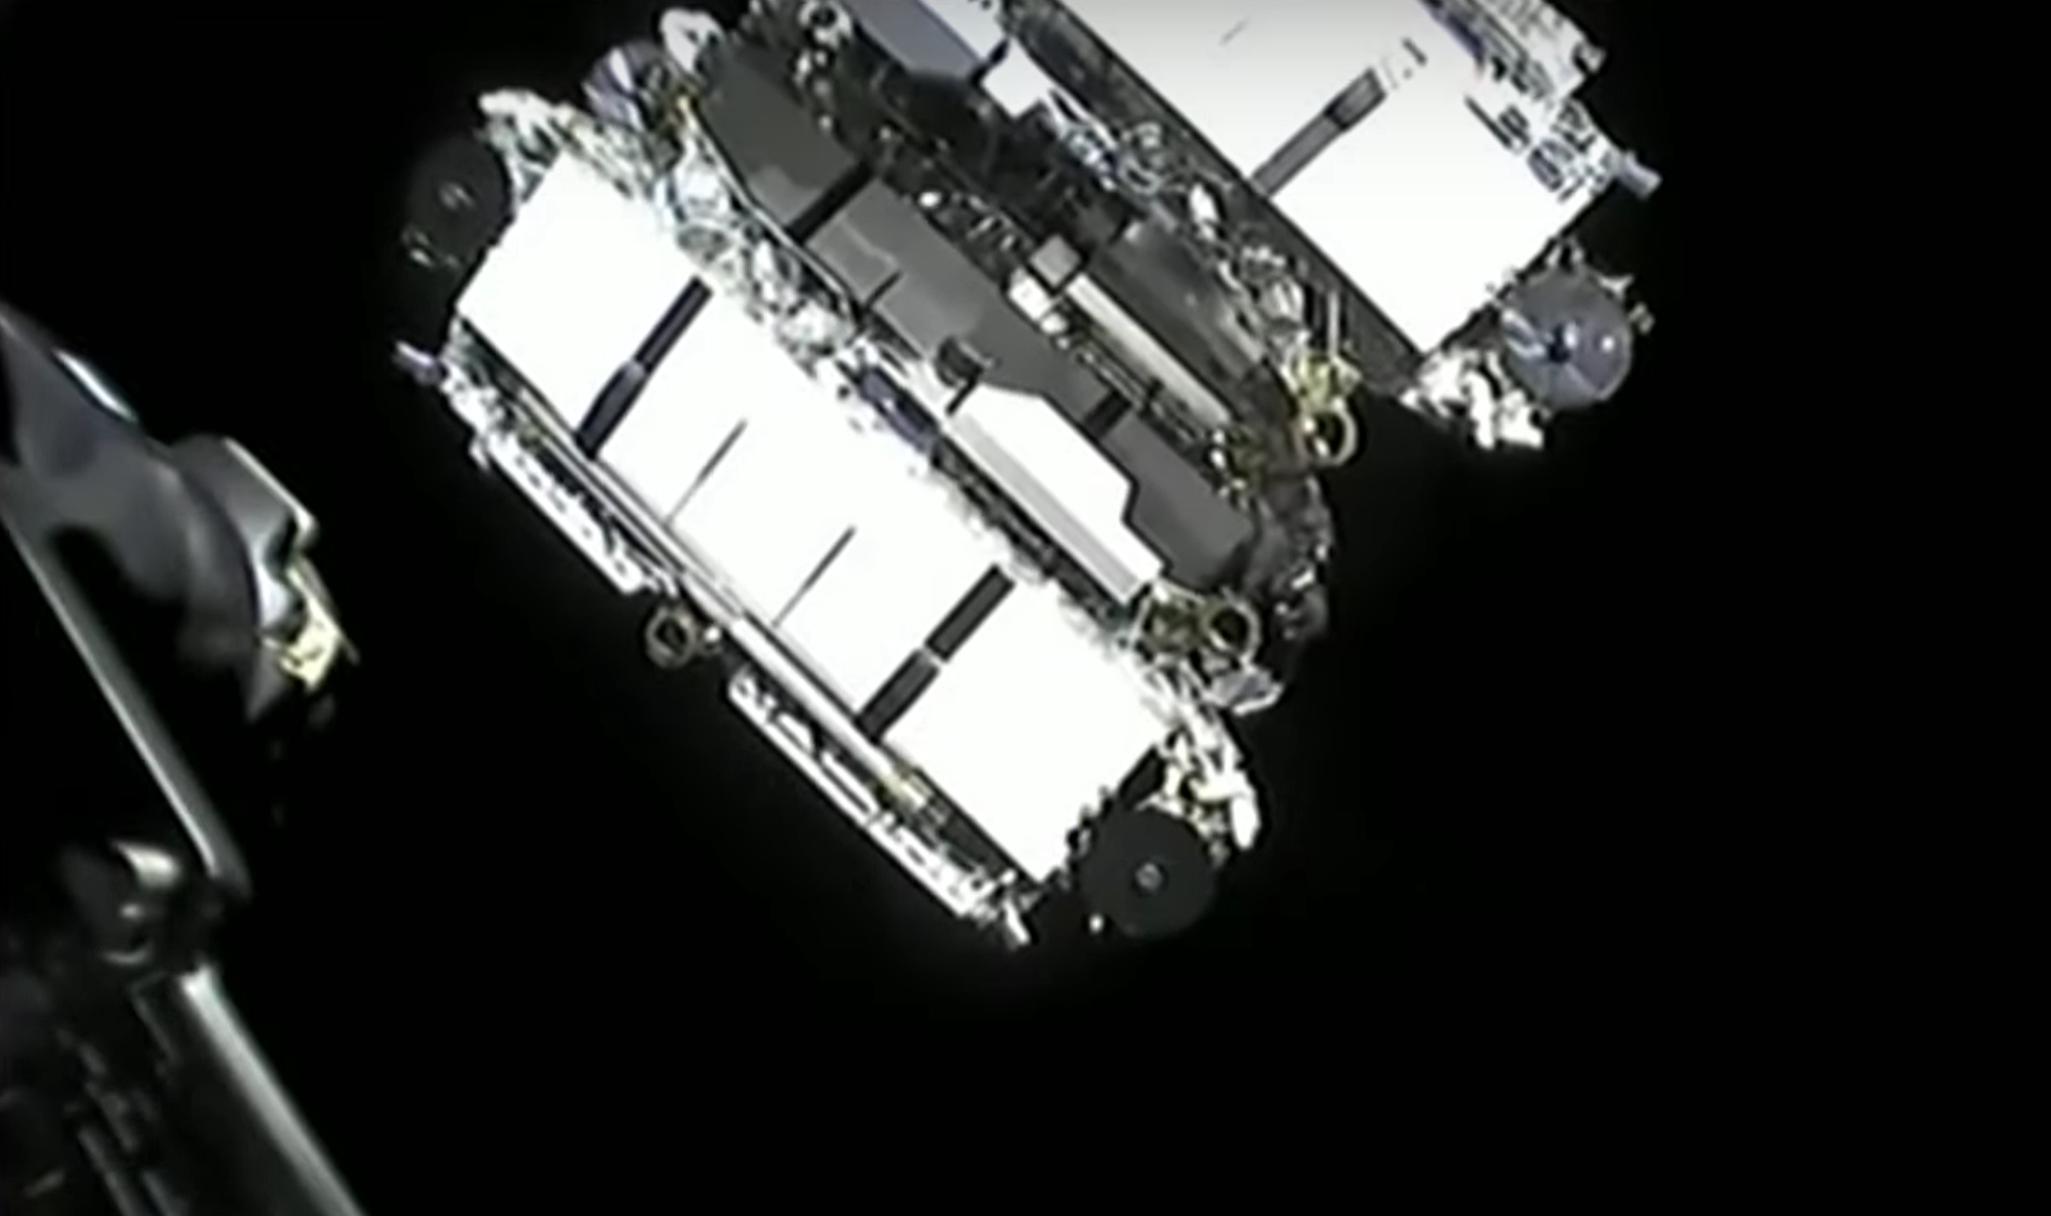 Starlink-20 Falcon 9 B1058 LC-40 031121 webcast (SpaceX) deploy 6 crop